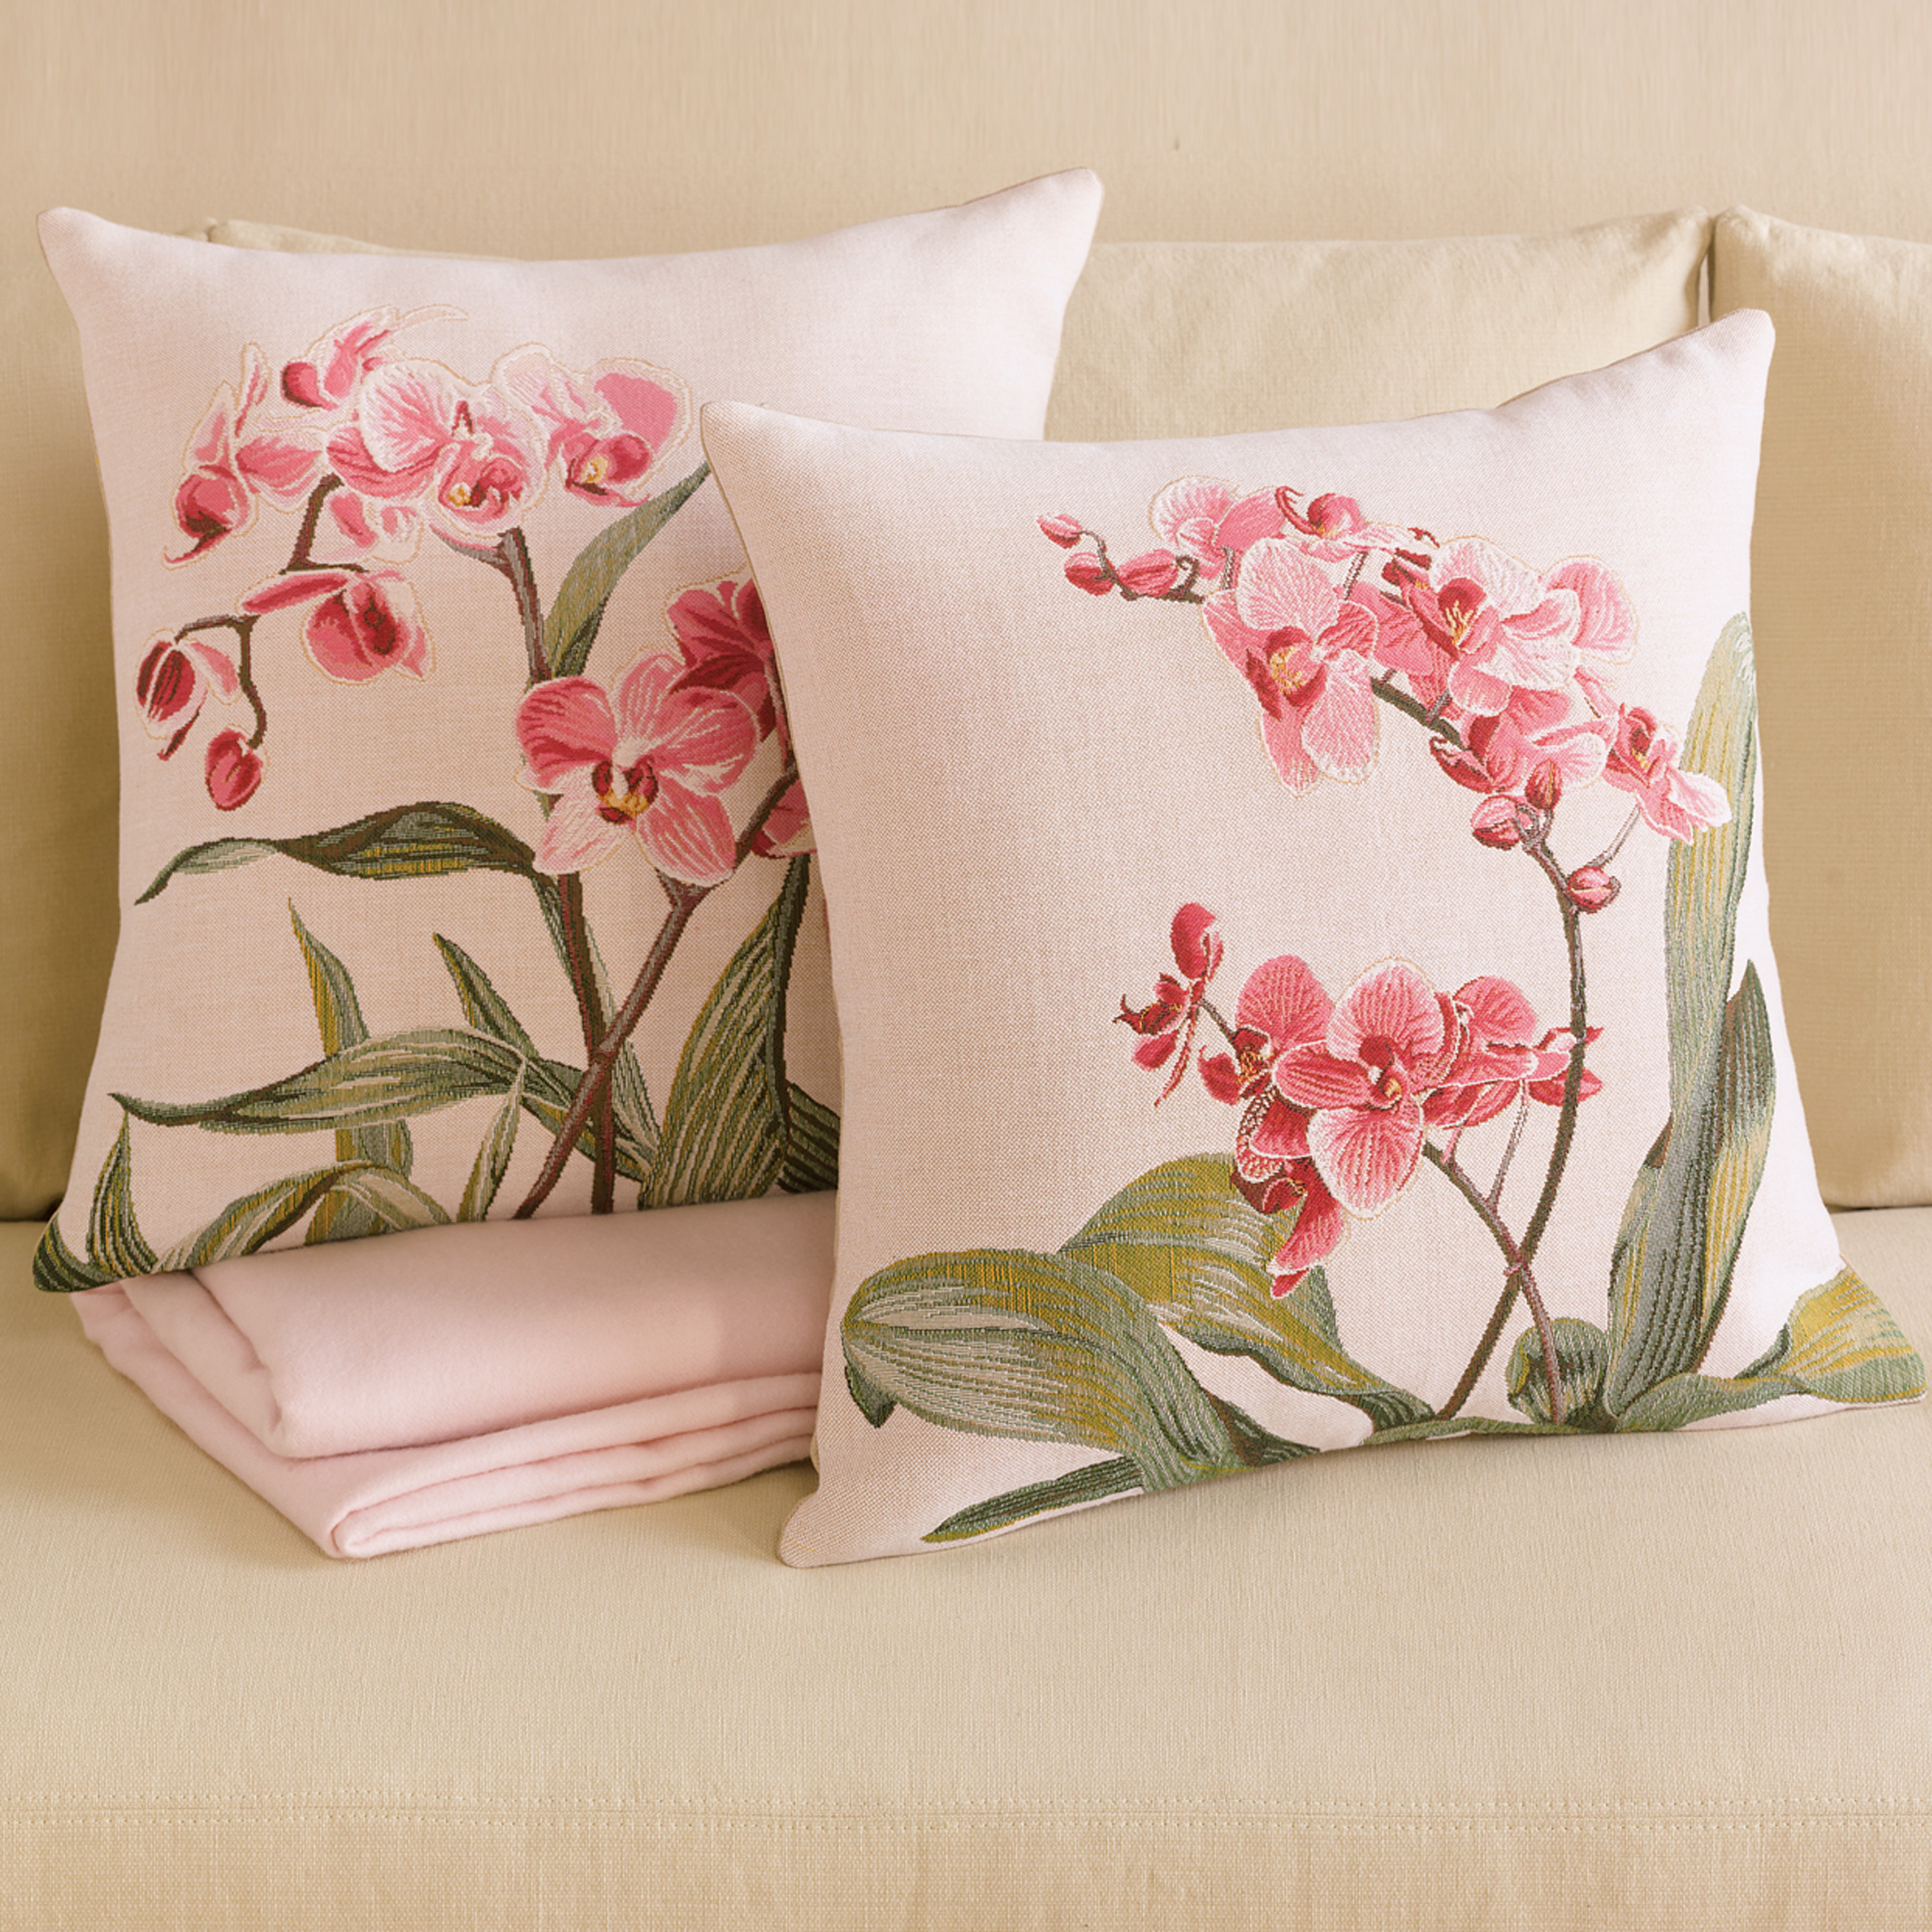 Throw Pillows Home : Orchid Pillows Gump s